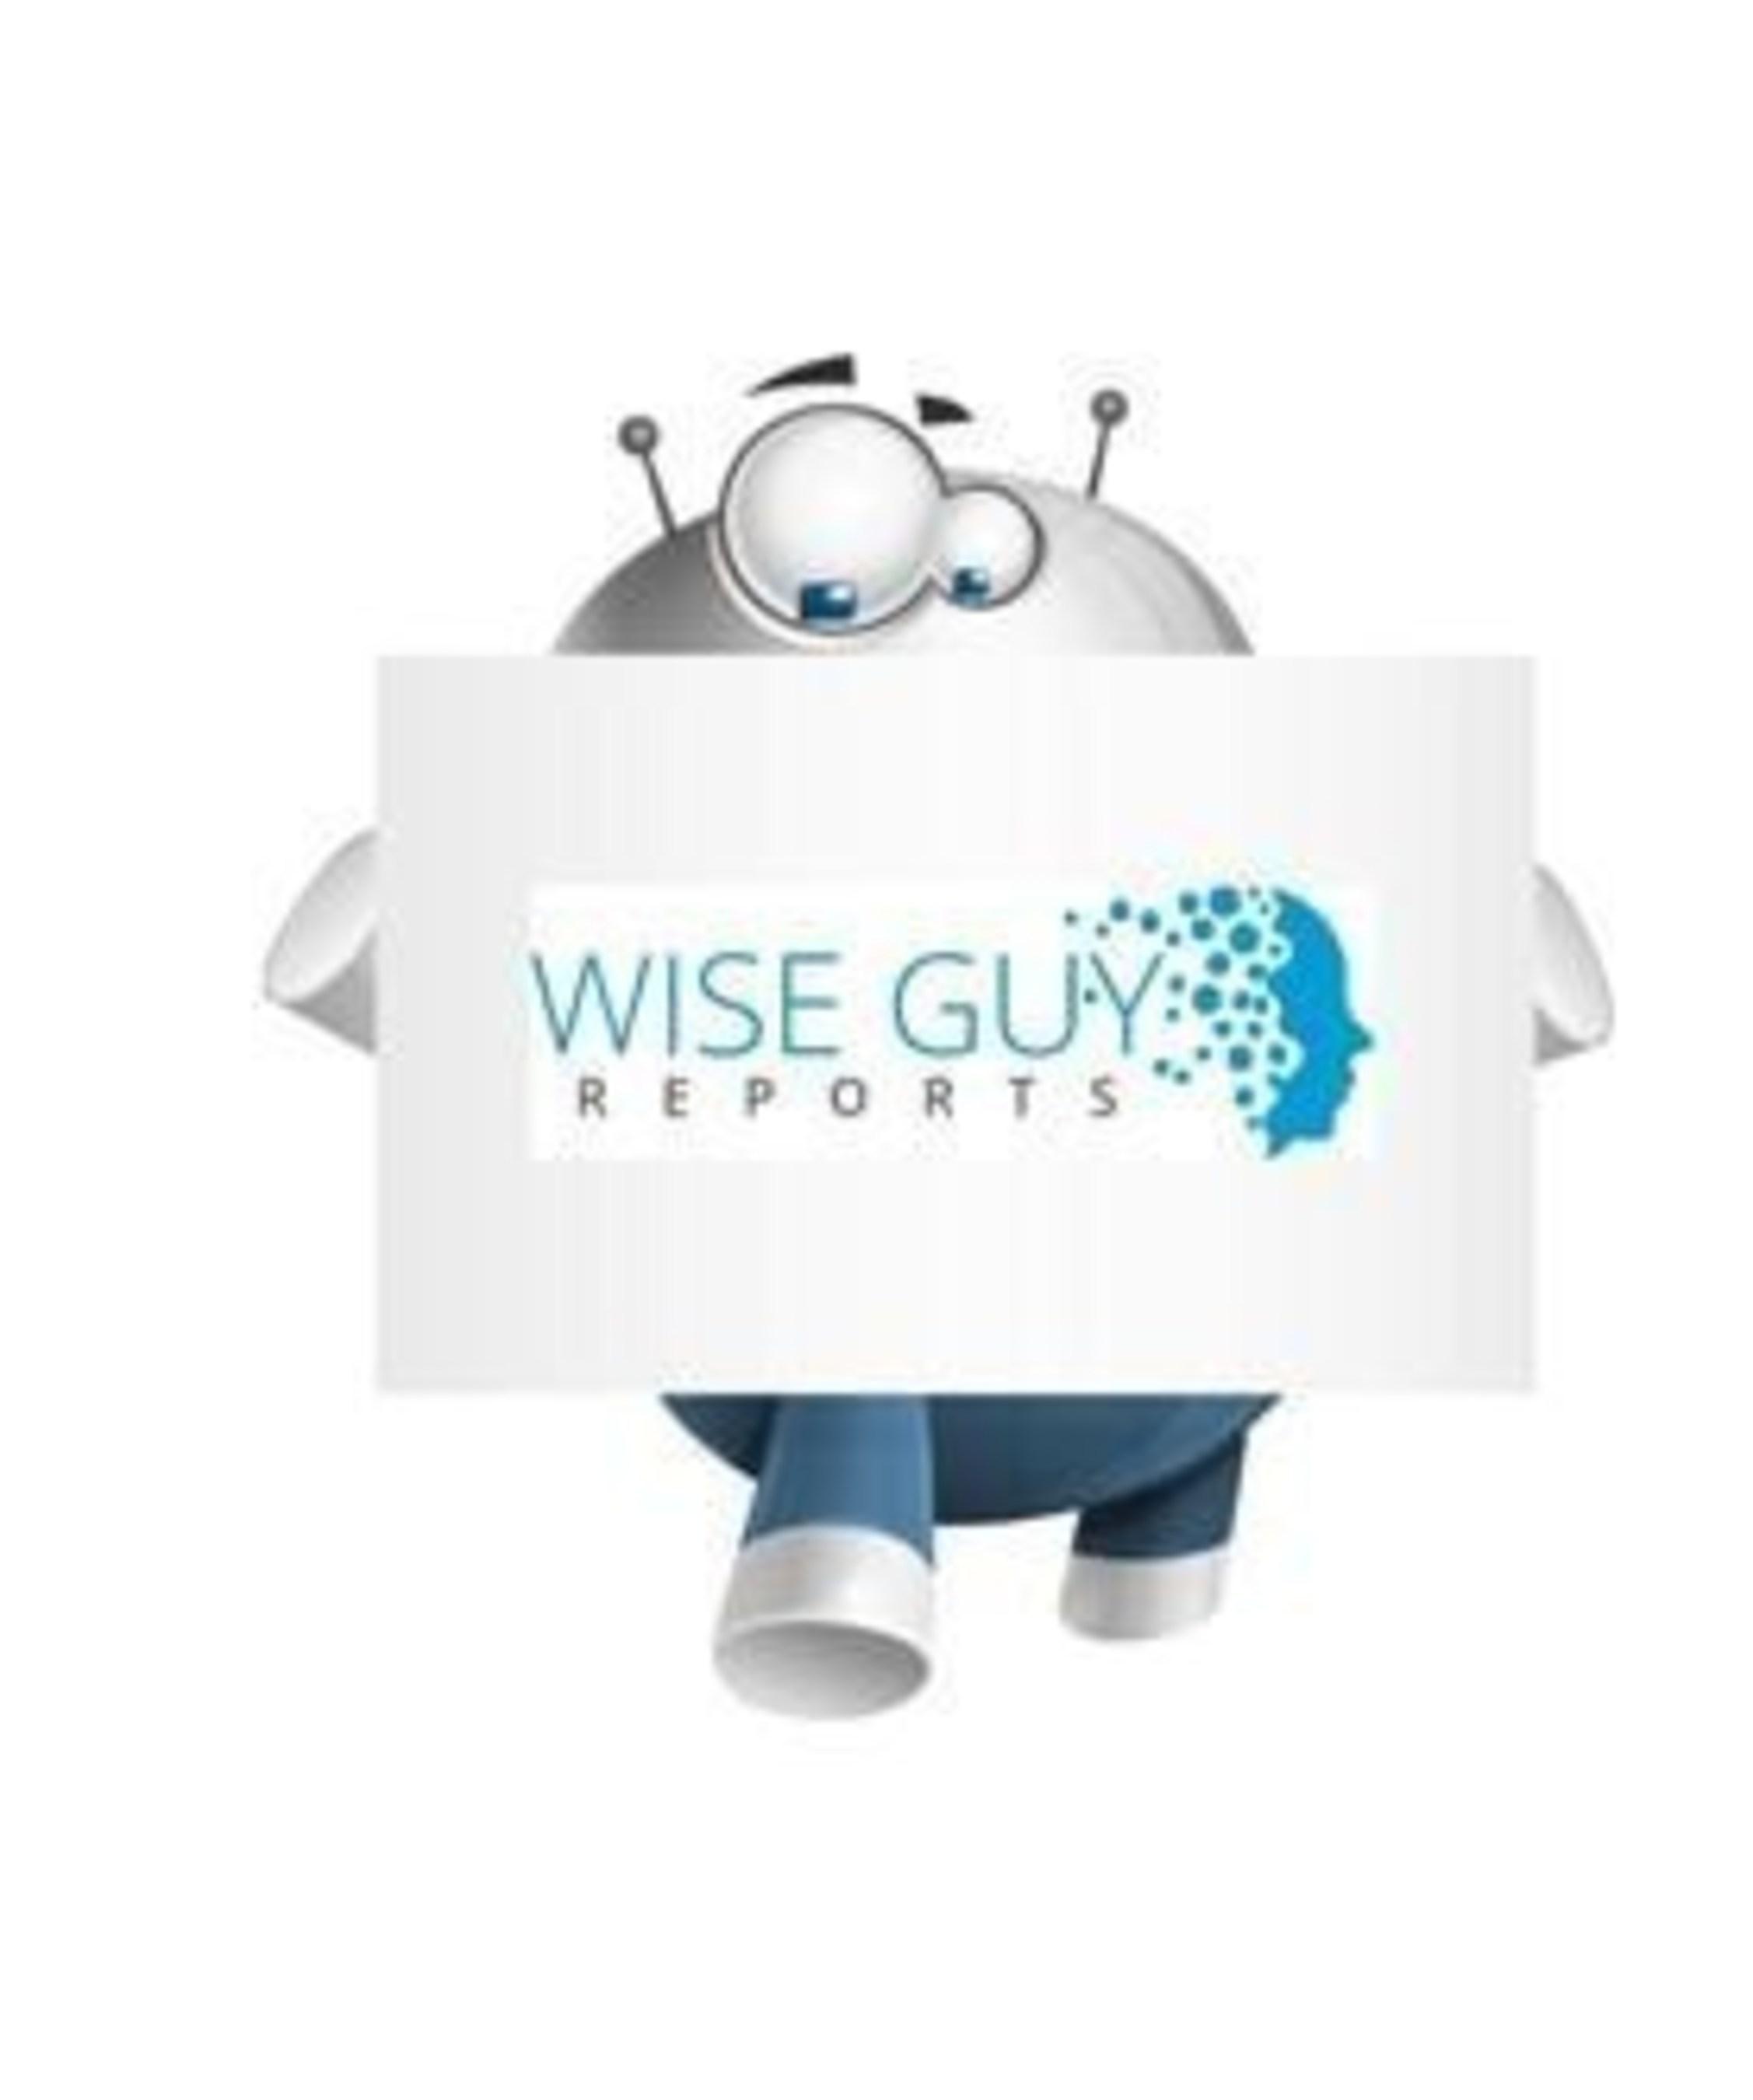 Wireless Gigabit Global Market Research Report 2021